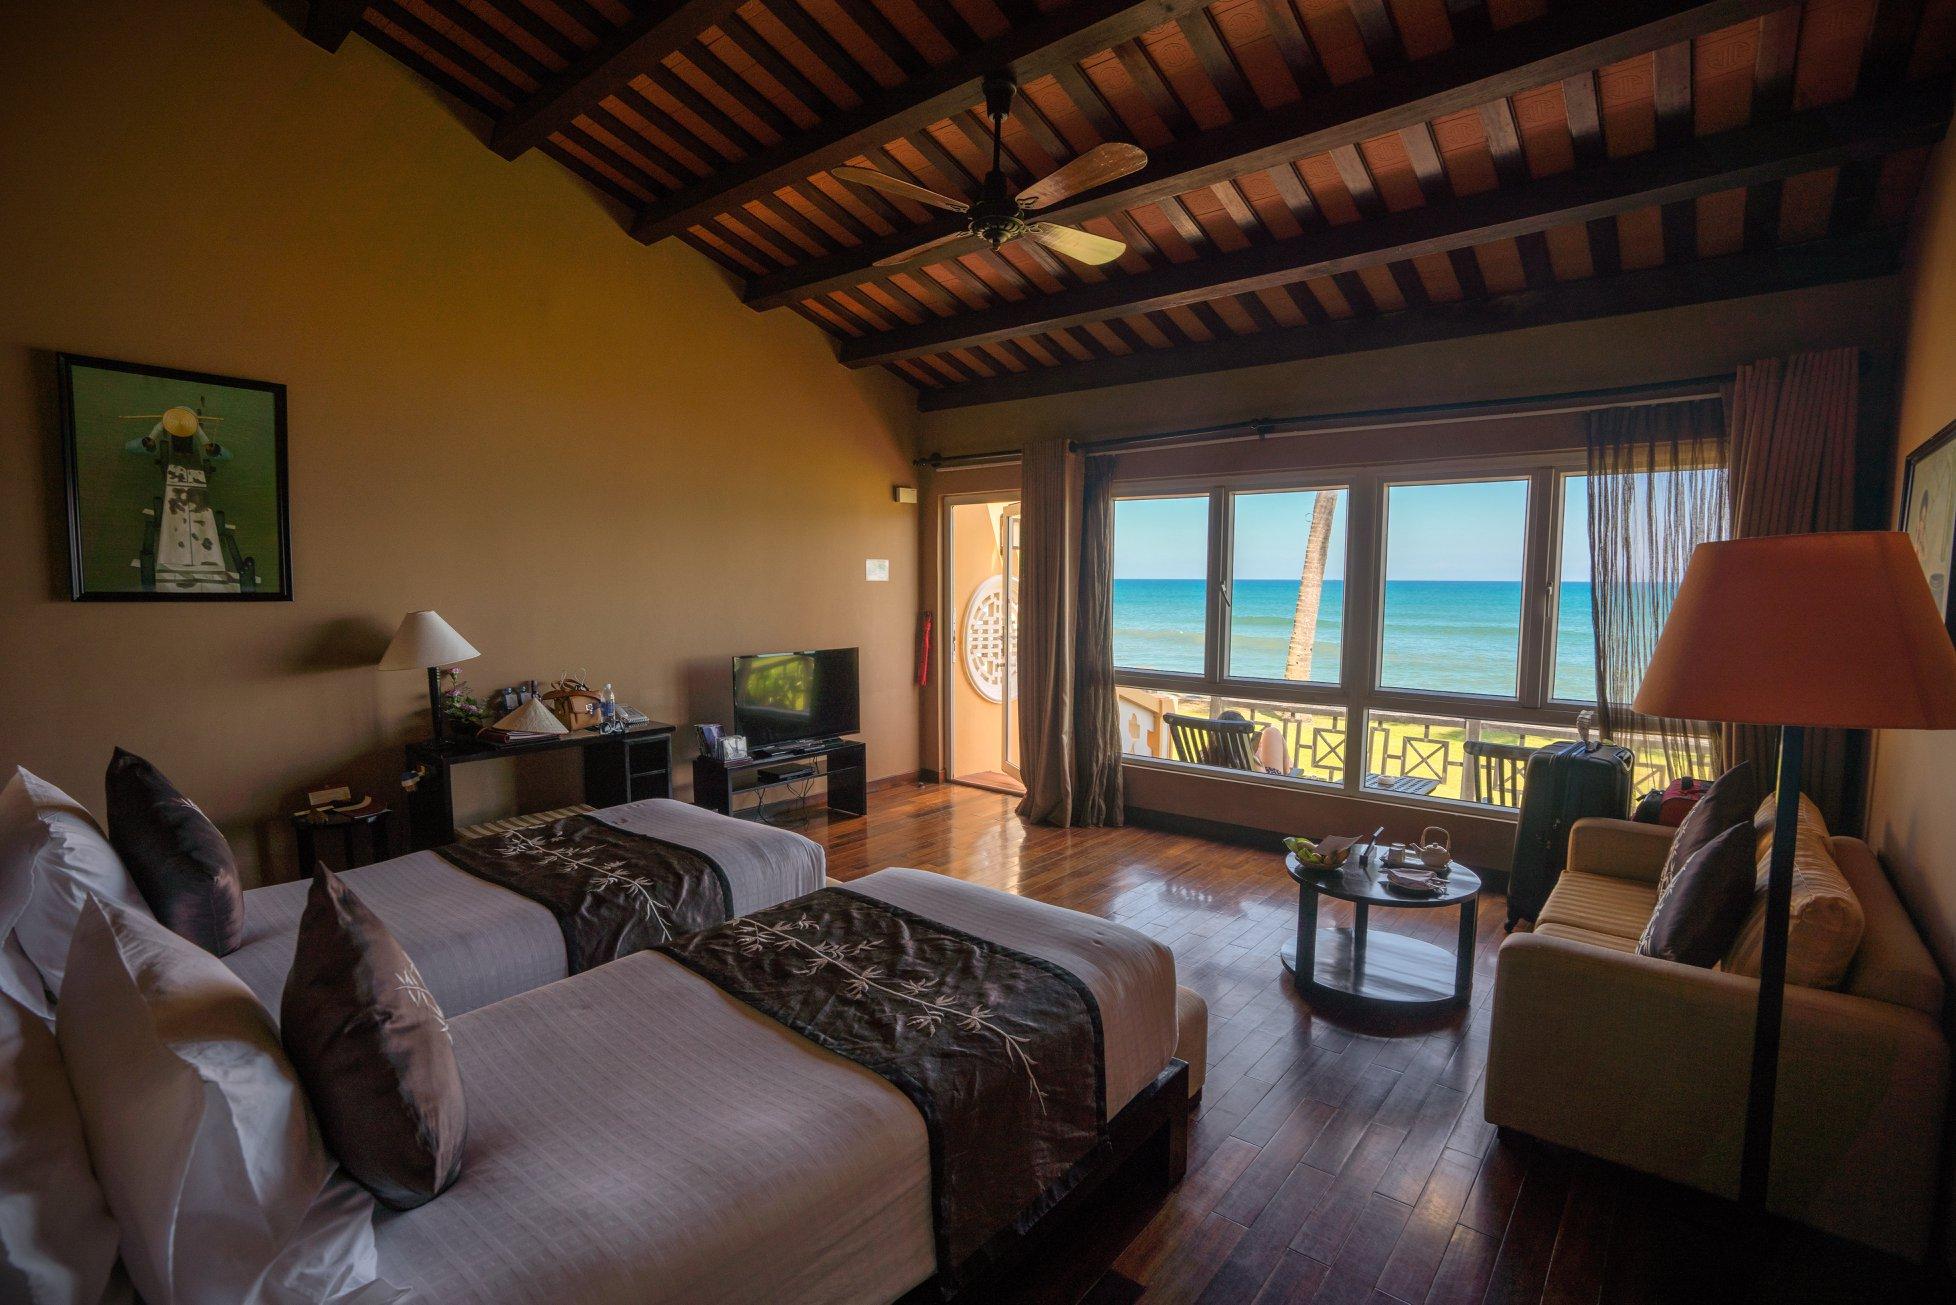 khu-nghi-duong-victoria-hoi-an-beach-resort-spa-ivivu-4